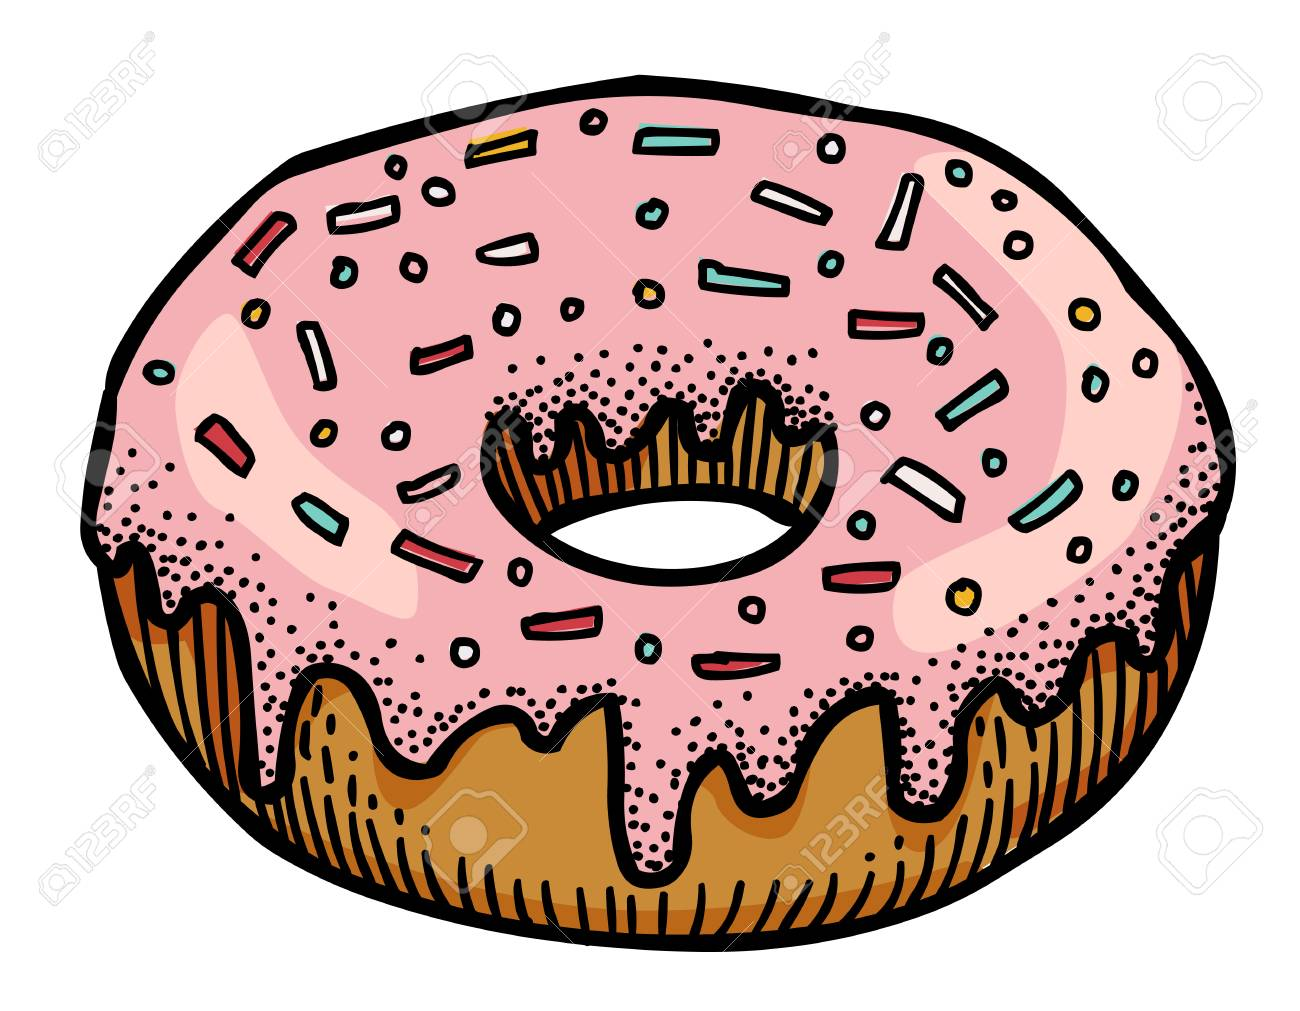 Cartoon Image Of Doughnut Royalty Free Cliparts Vectors And